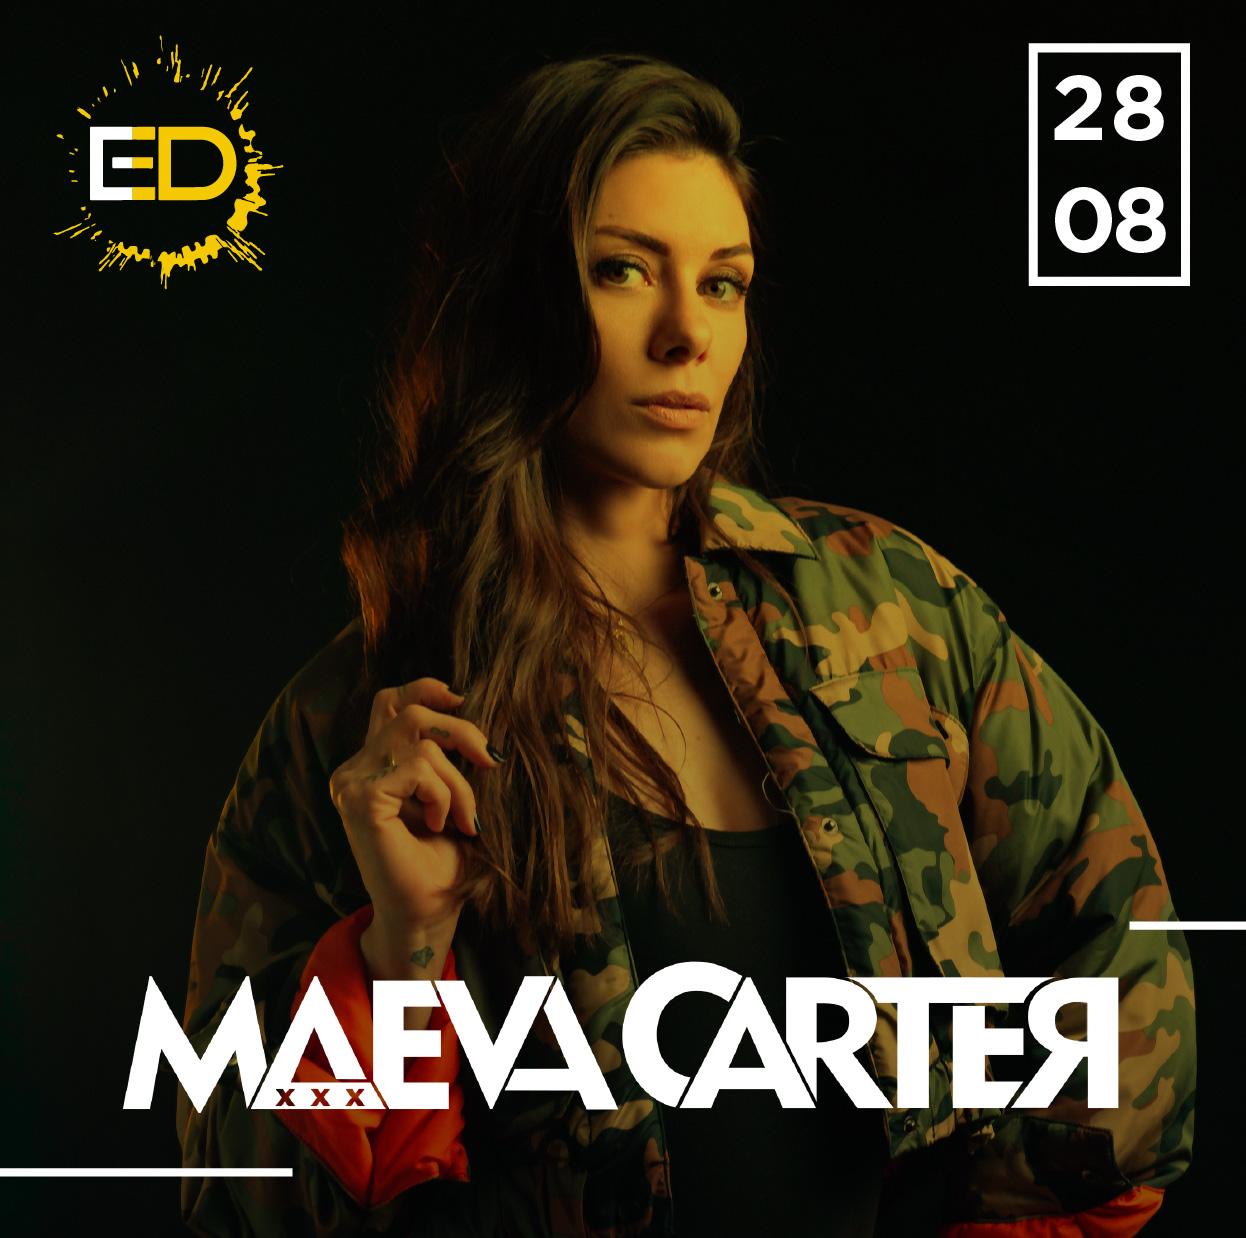 Maeva_Carter